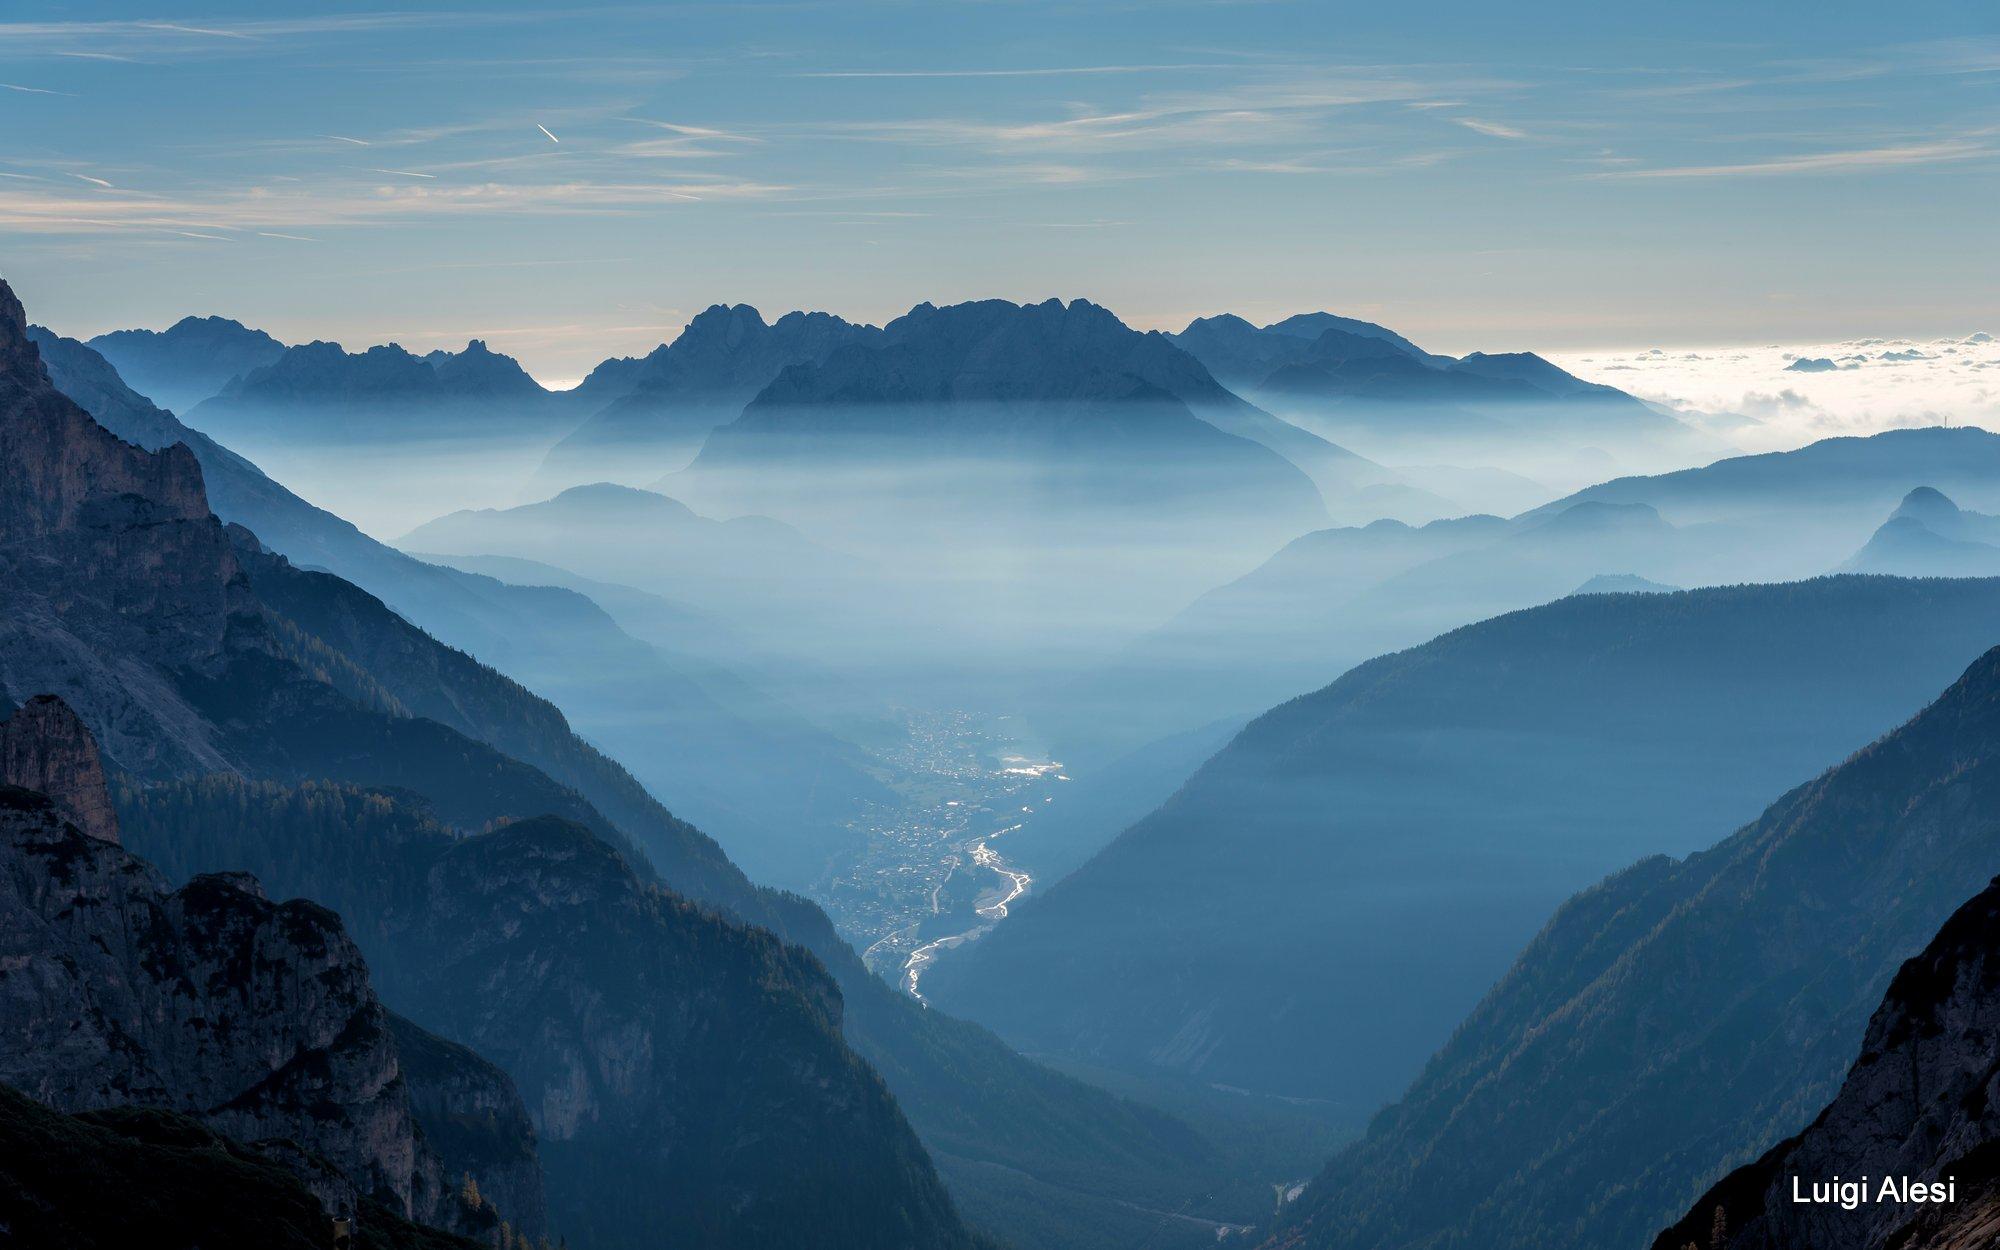 Dolomiti bellunesi, Italy